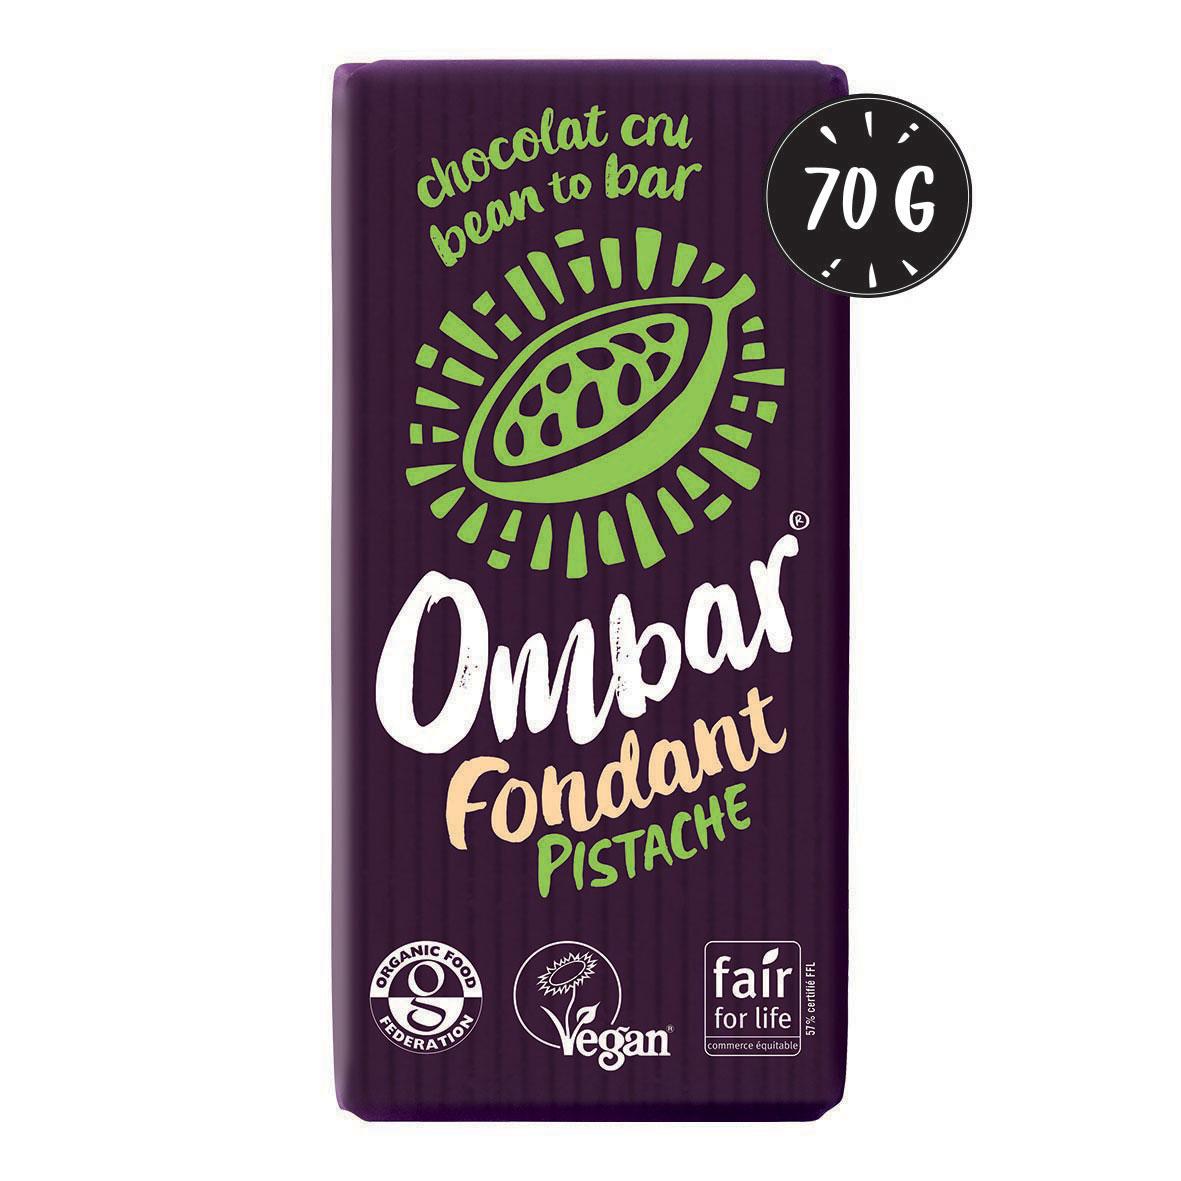 Ombar - Chocolat Cru Fondant Pistache 70g Bio